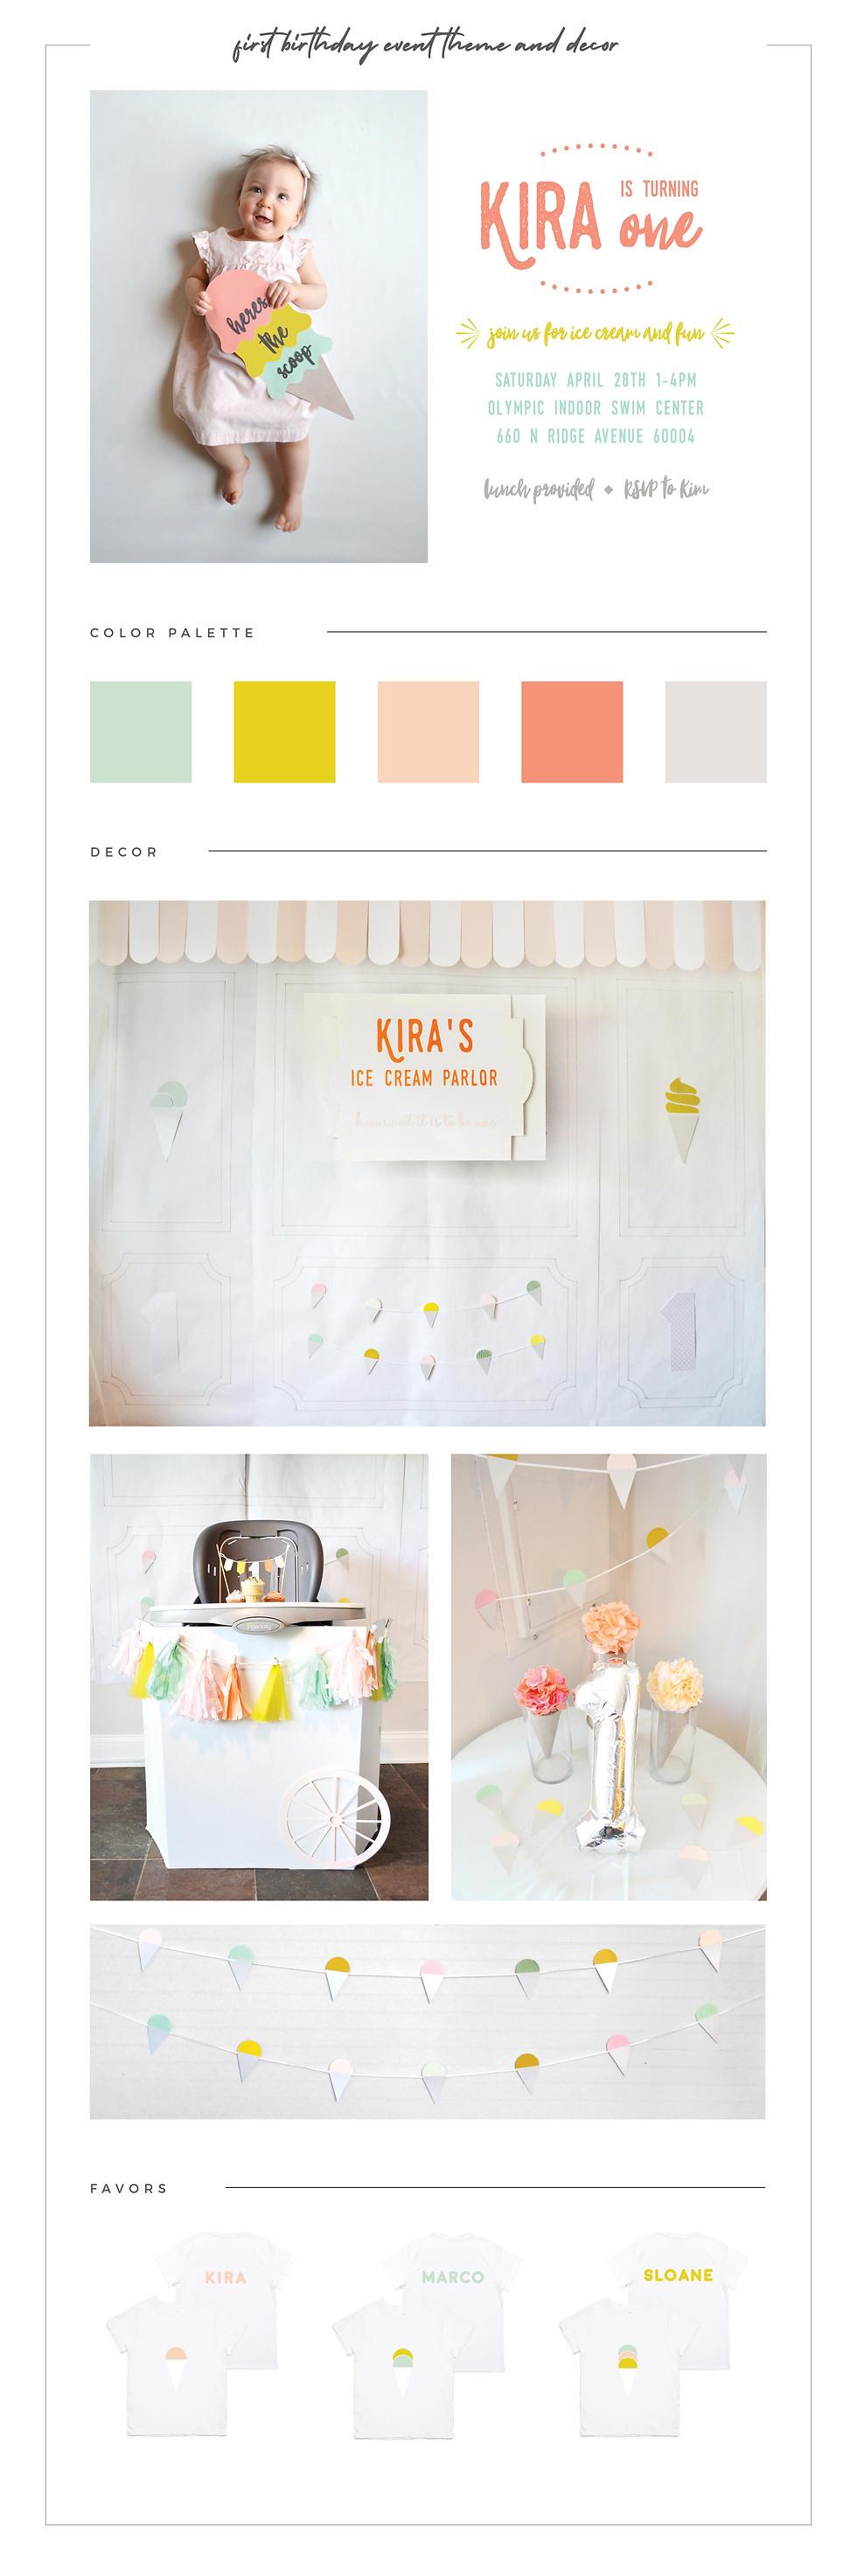 KIKI'S-BIRTHDAY.jpg